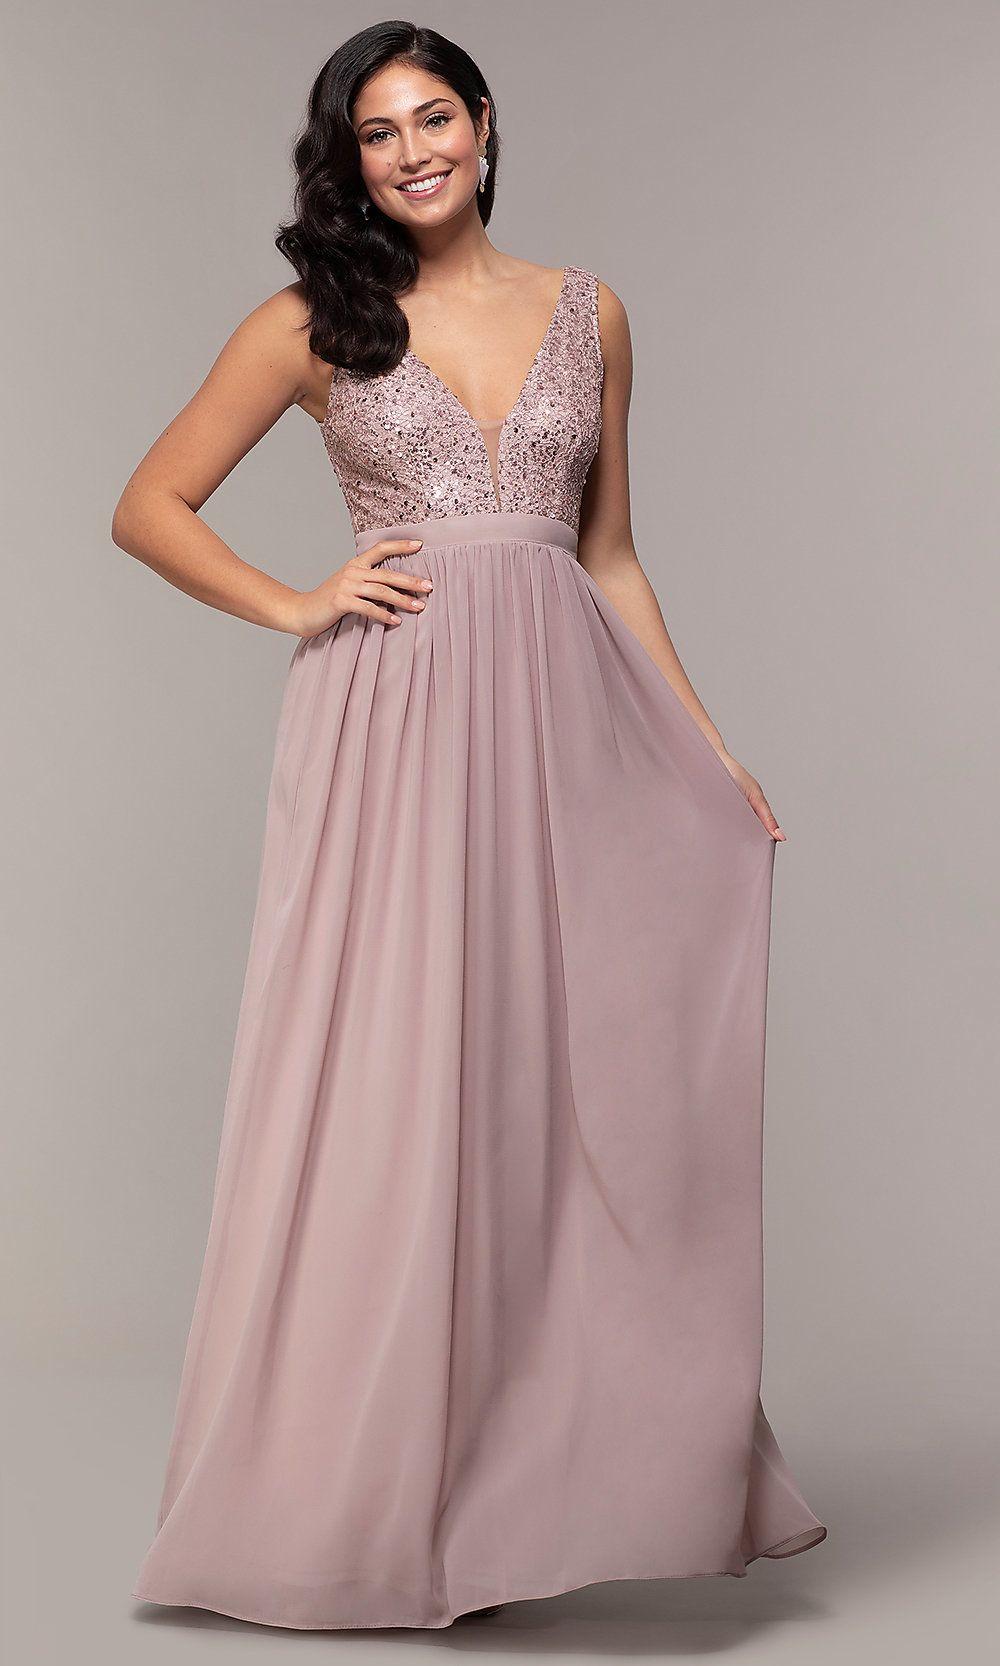 Long-Sleeve Black Sequin Homecoming Dress - PromGirl